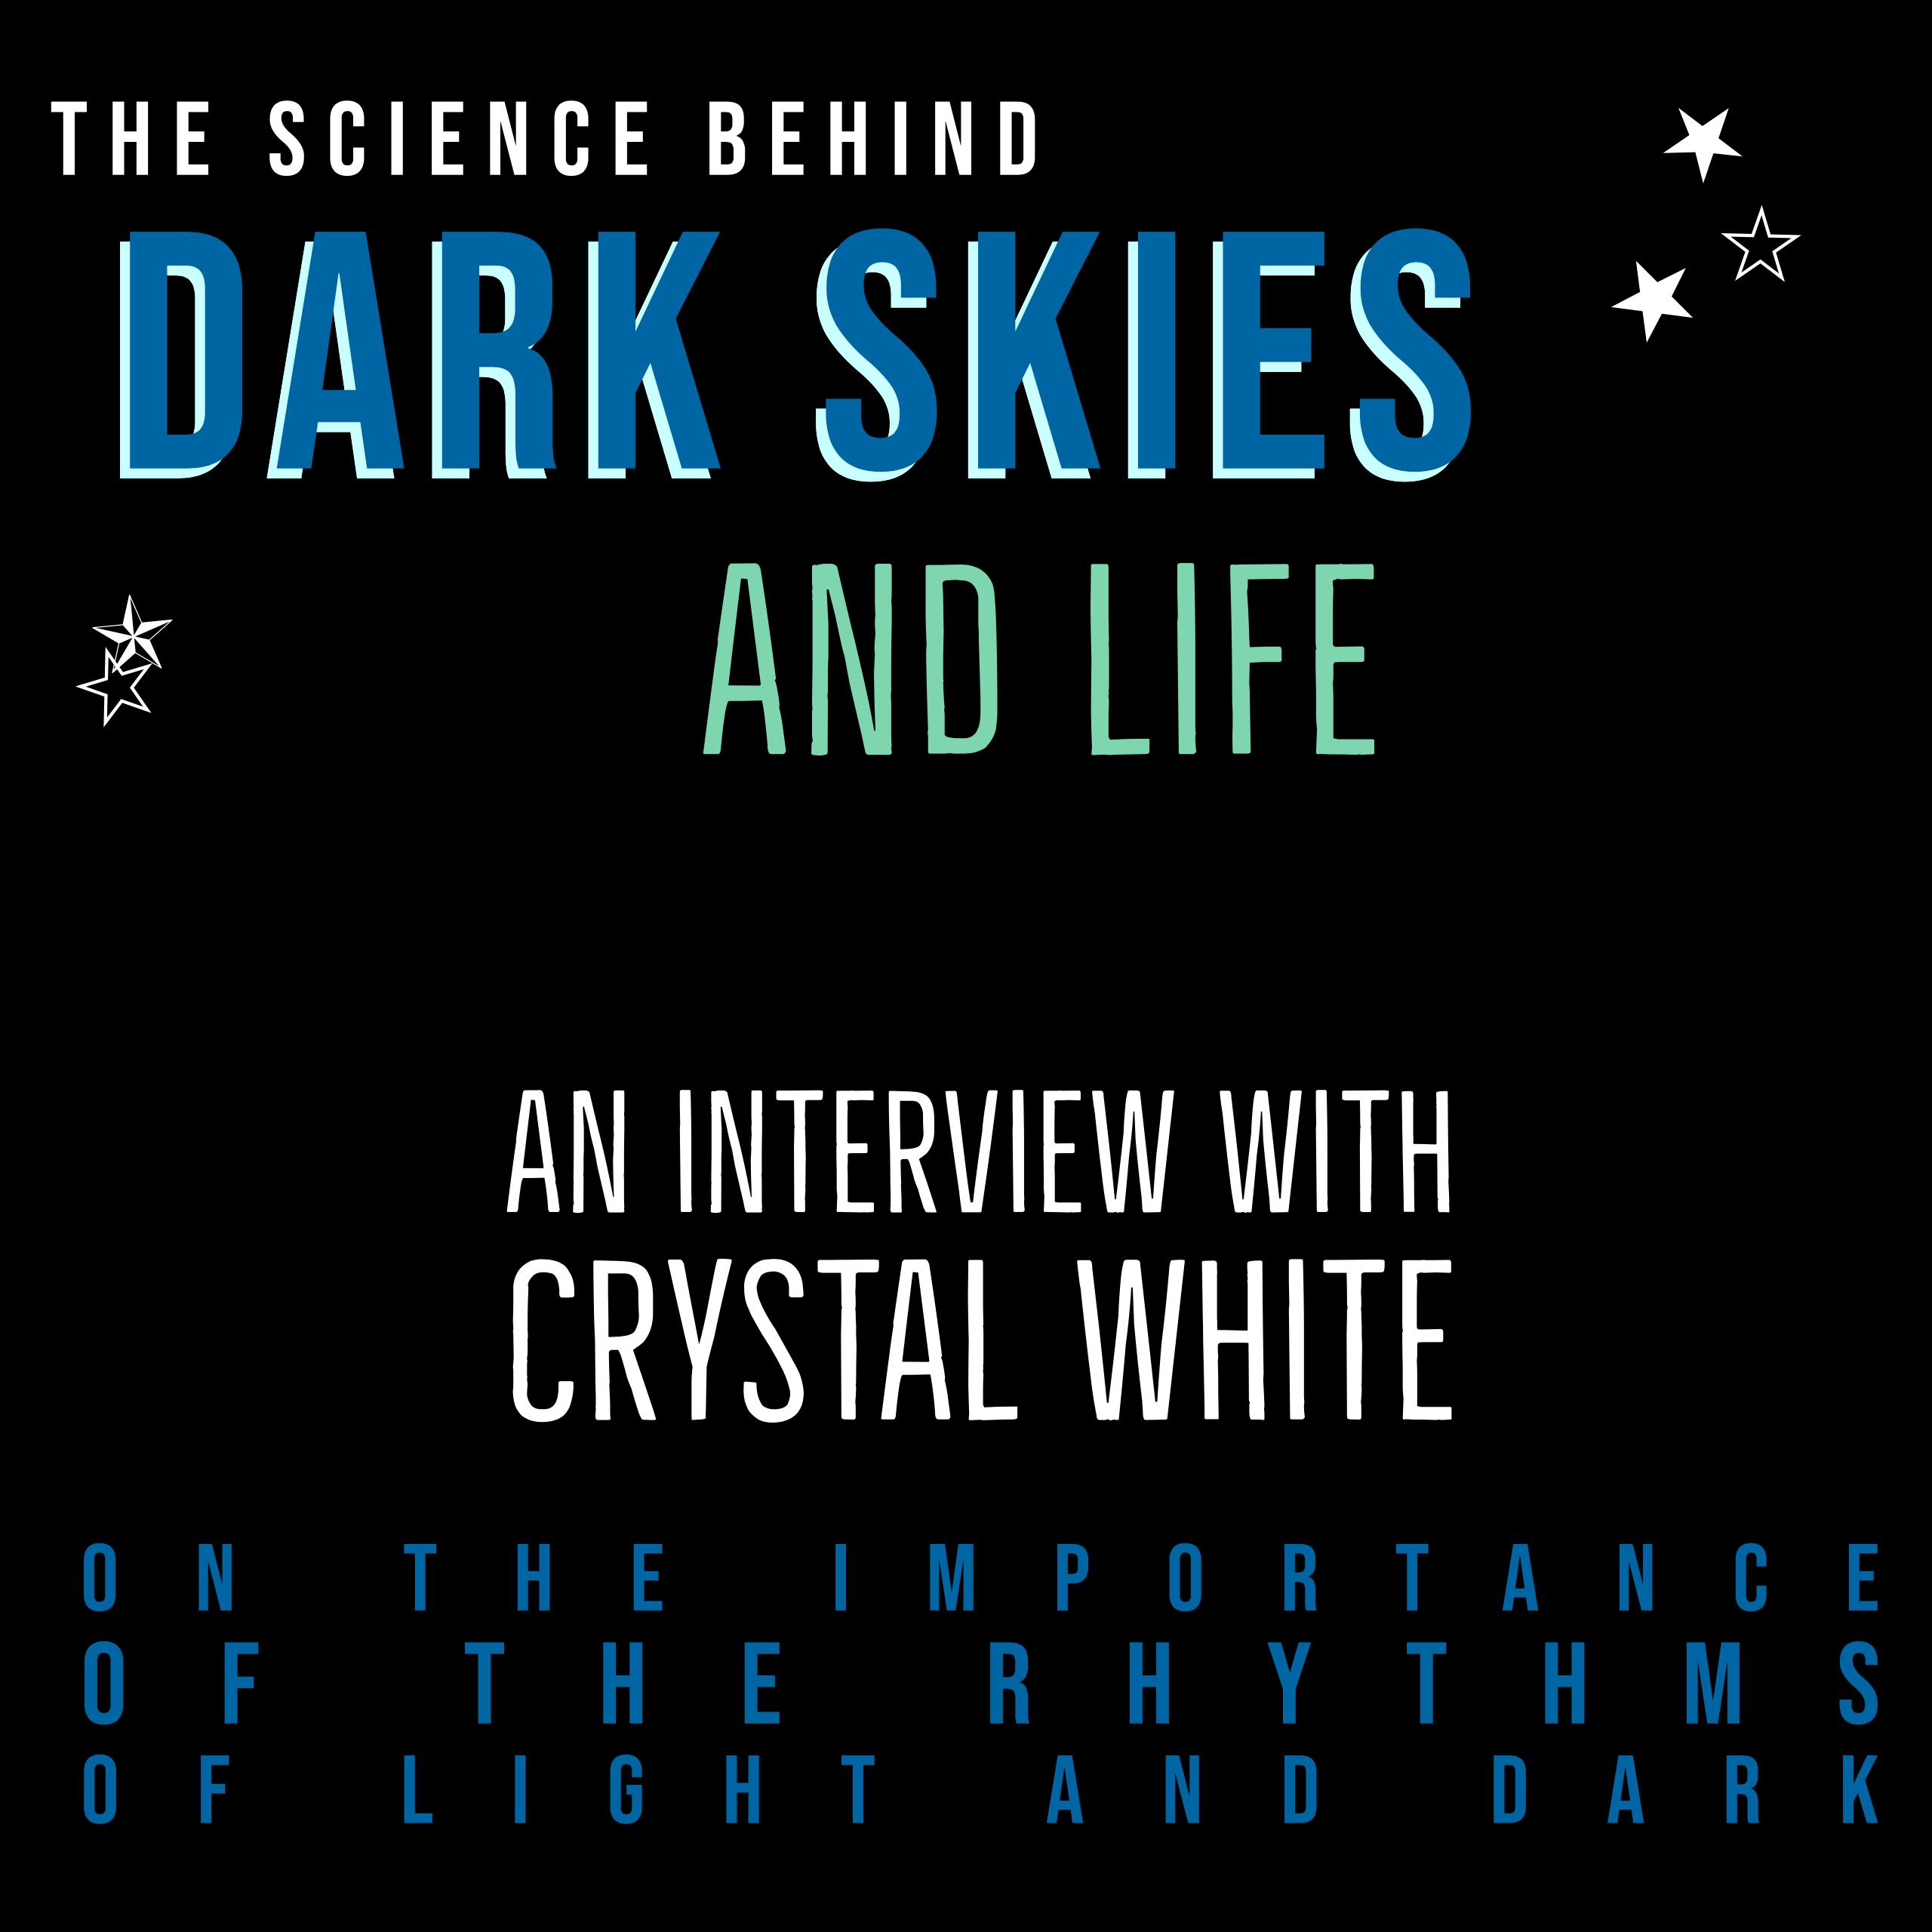 The Science between Dark Skies and Life